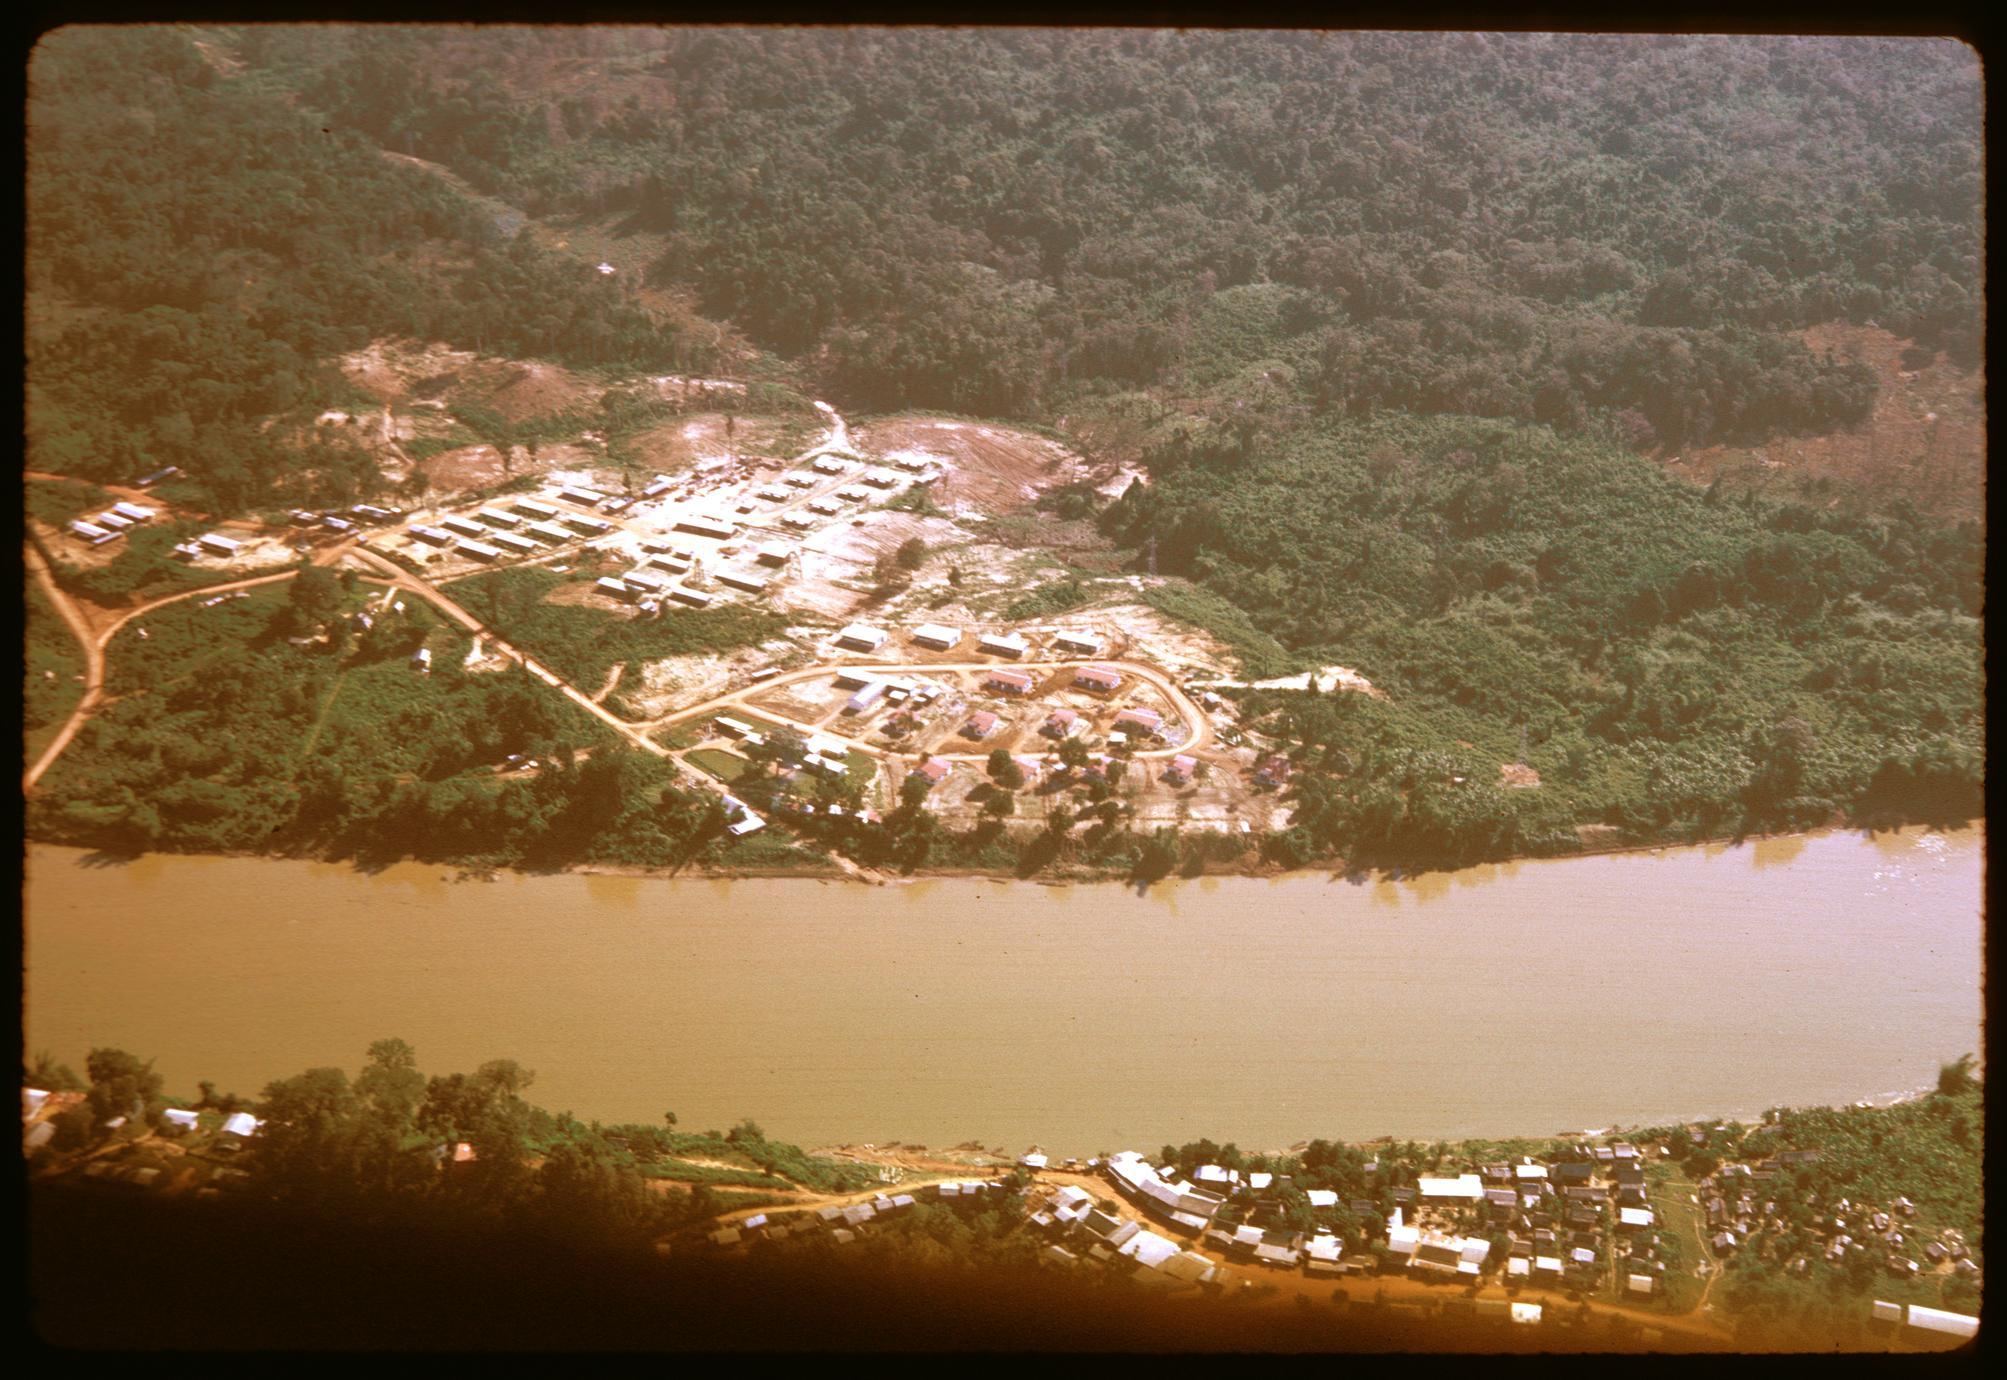 Settlement near dam area--workers' housing